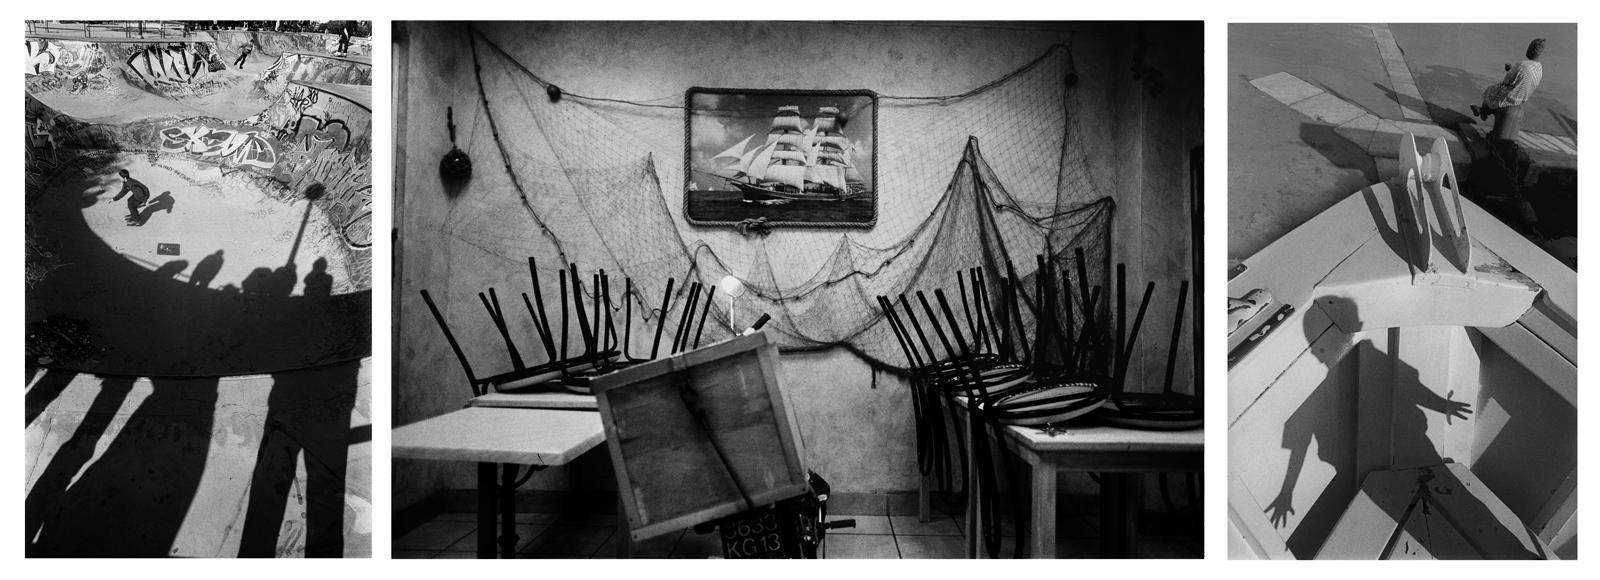 Art and Documentary Photography - Loading 042_Marseille___Fabio_Sgroi.jpg